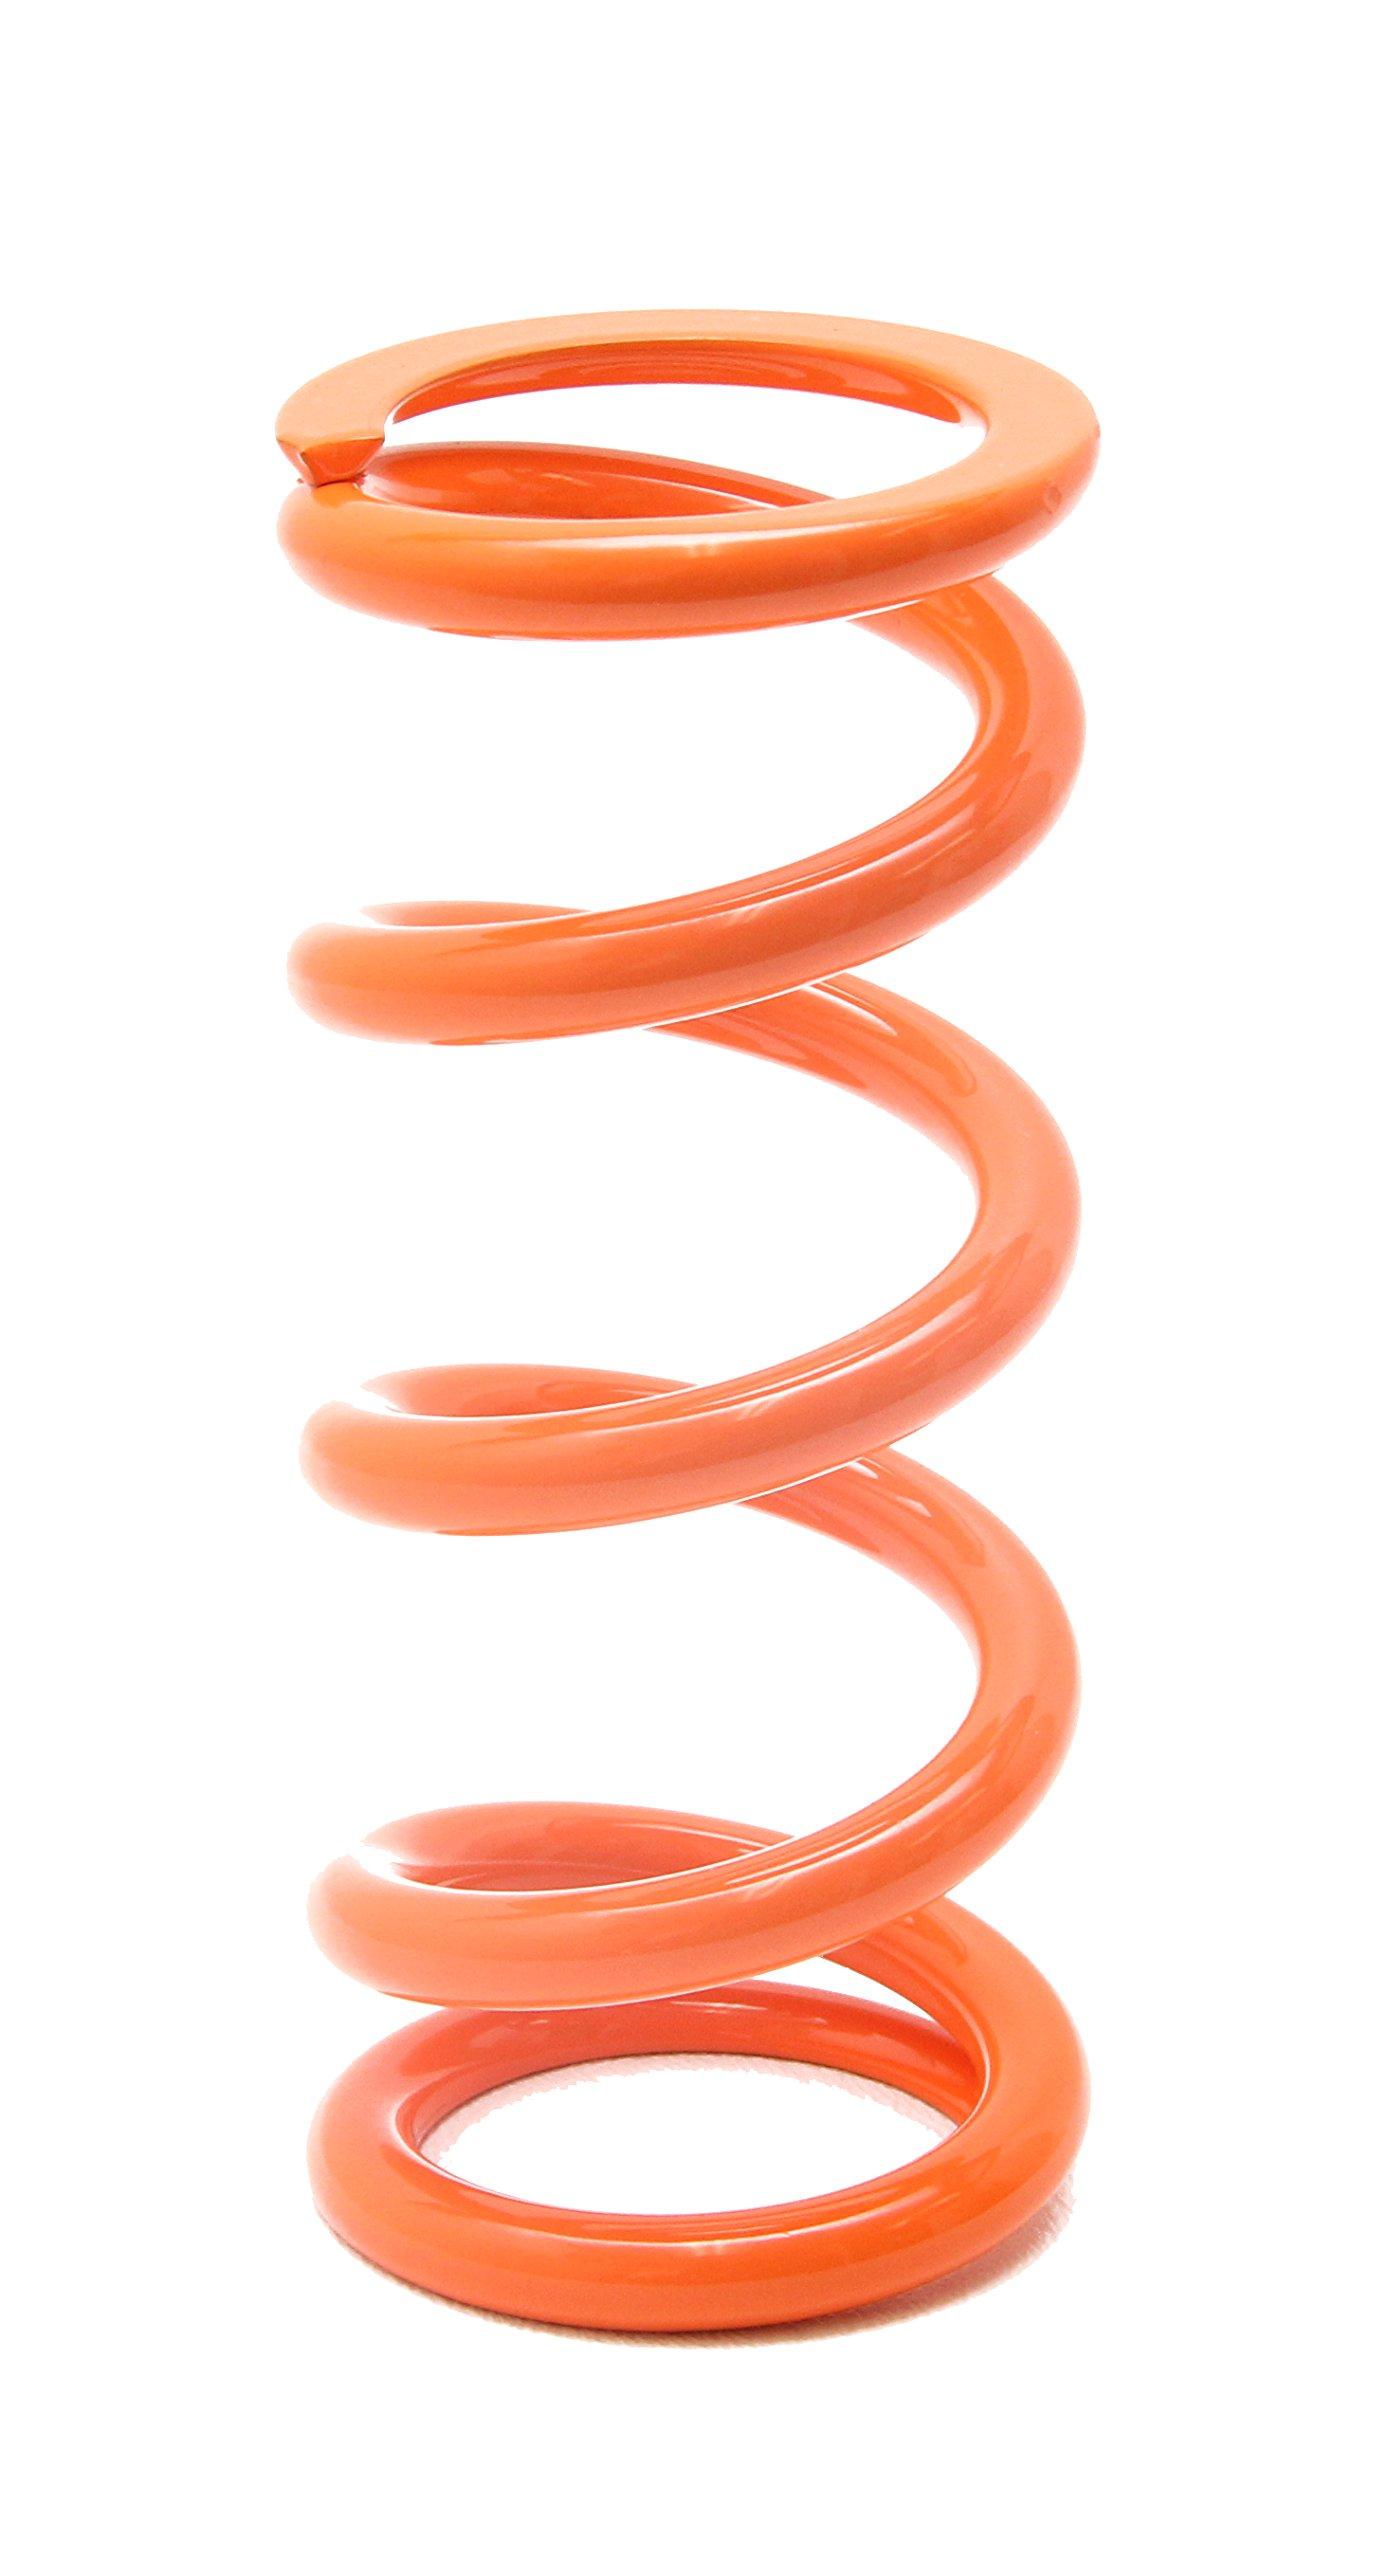 Fox SLS Coil Rear Shock Spring 525lbs x 3.0 Stroke Orange